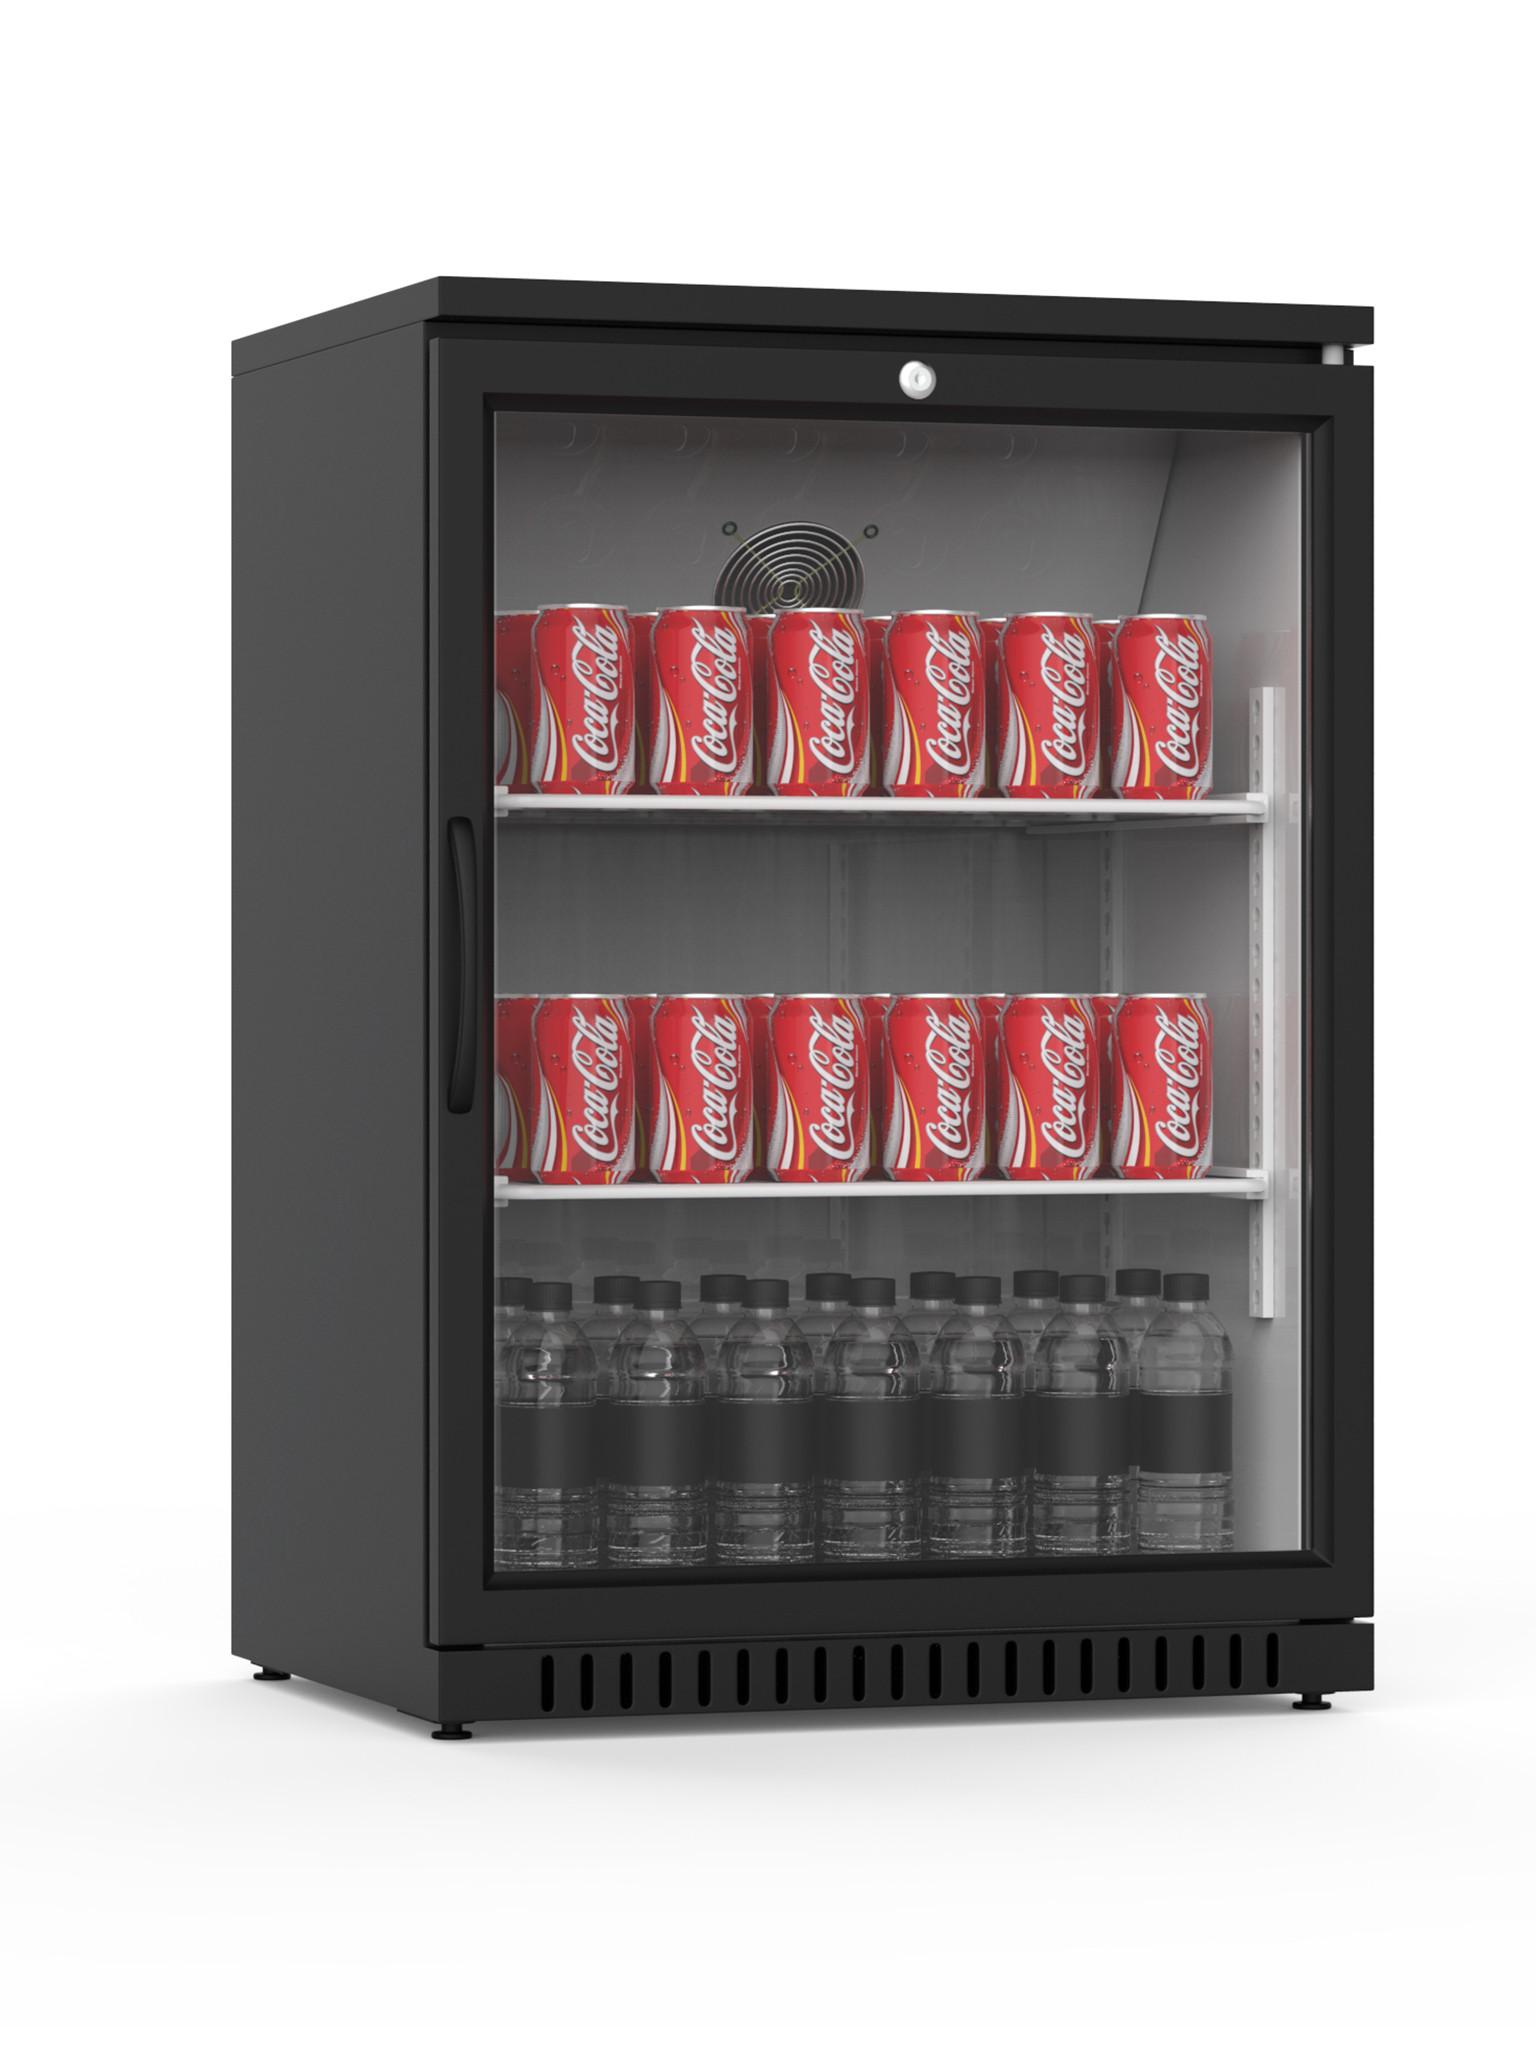 Promoline - 130 liter - 1 deurs - Zwart | Koelkast glazen deur